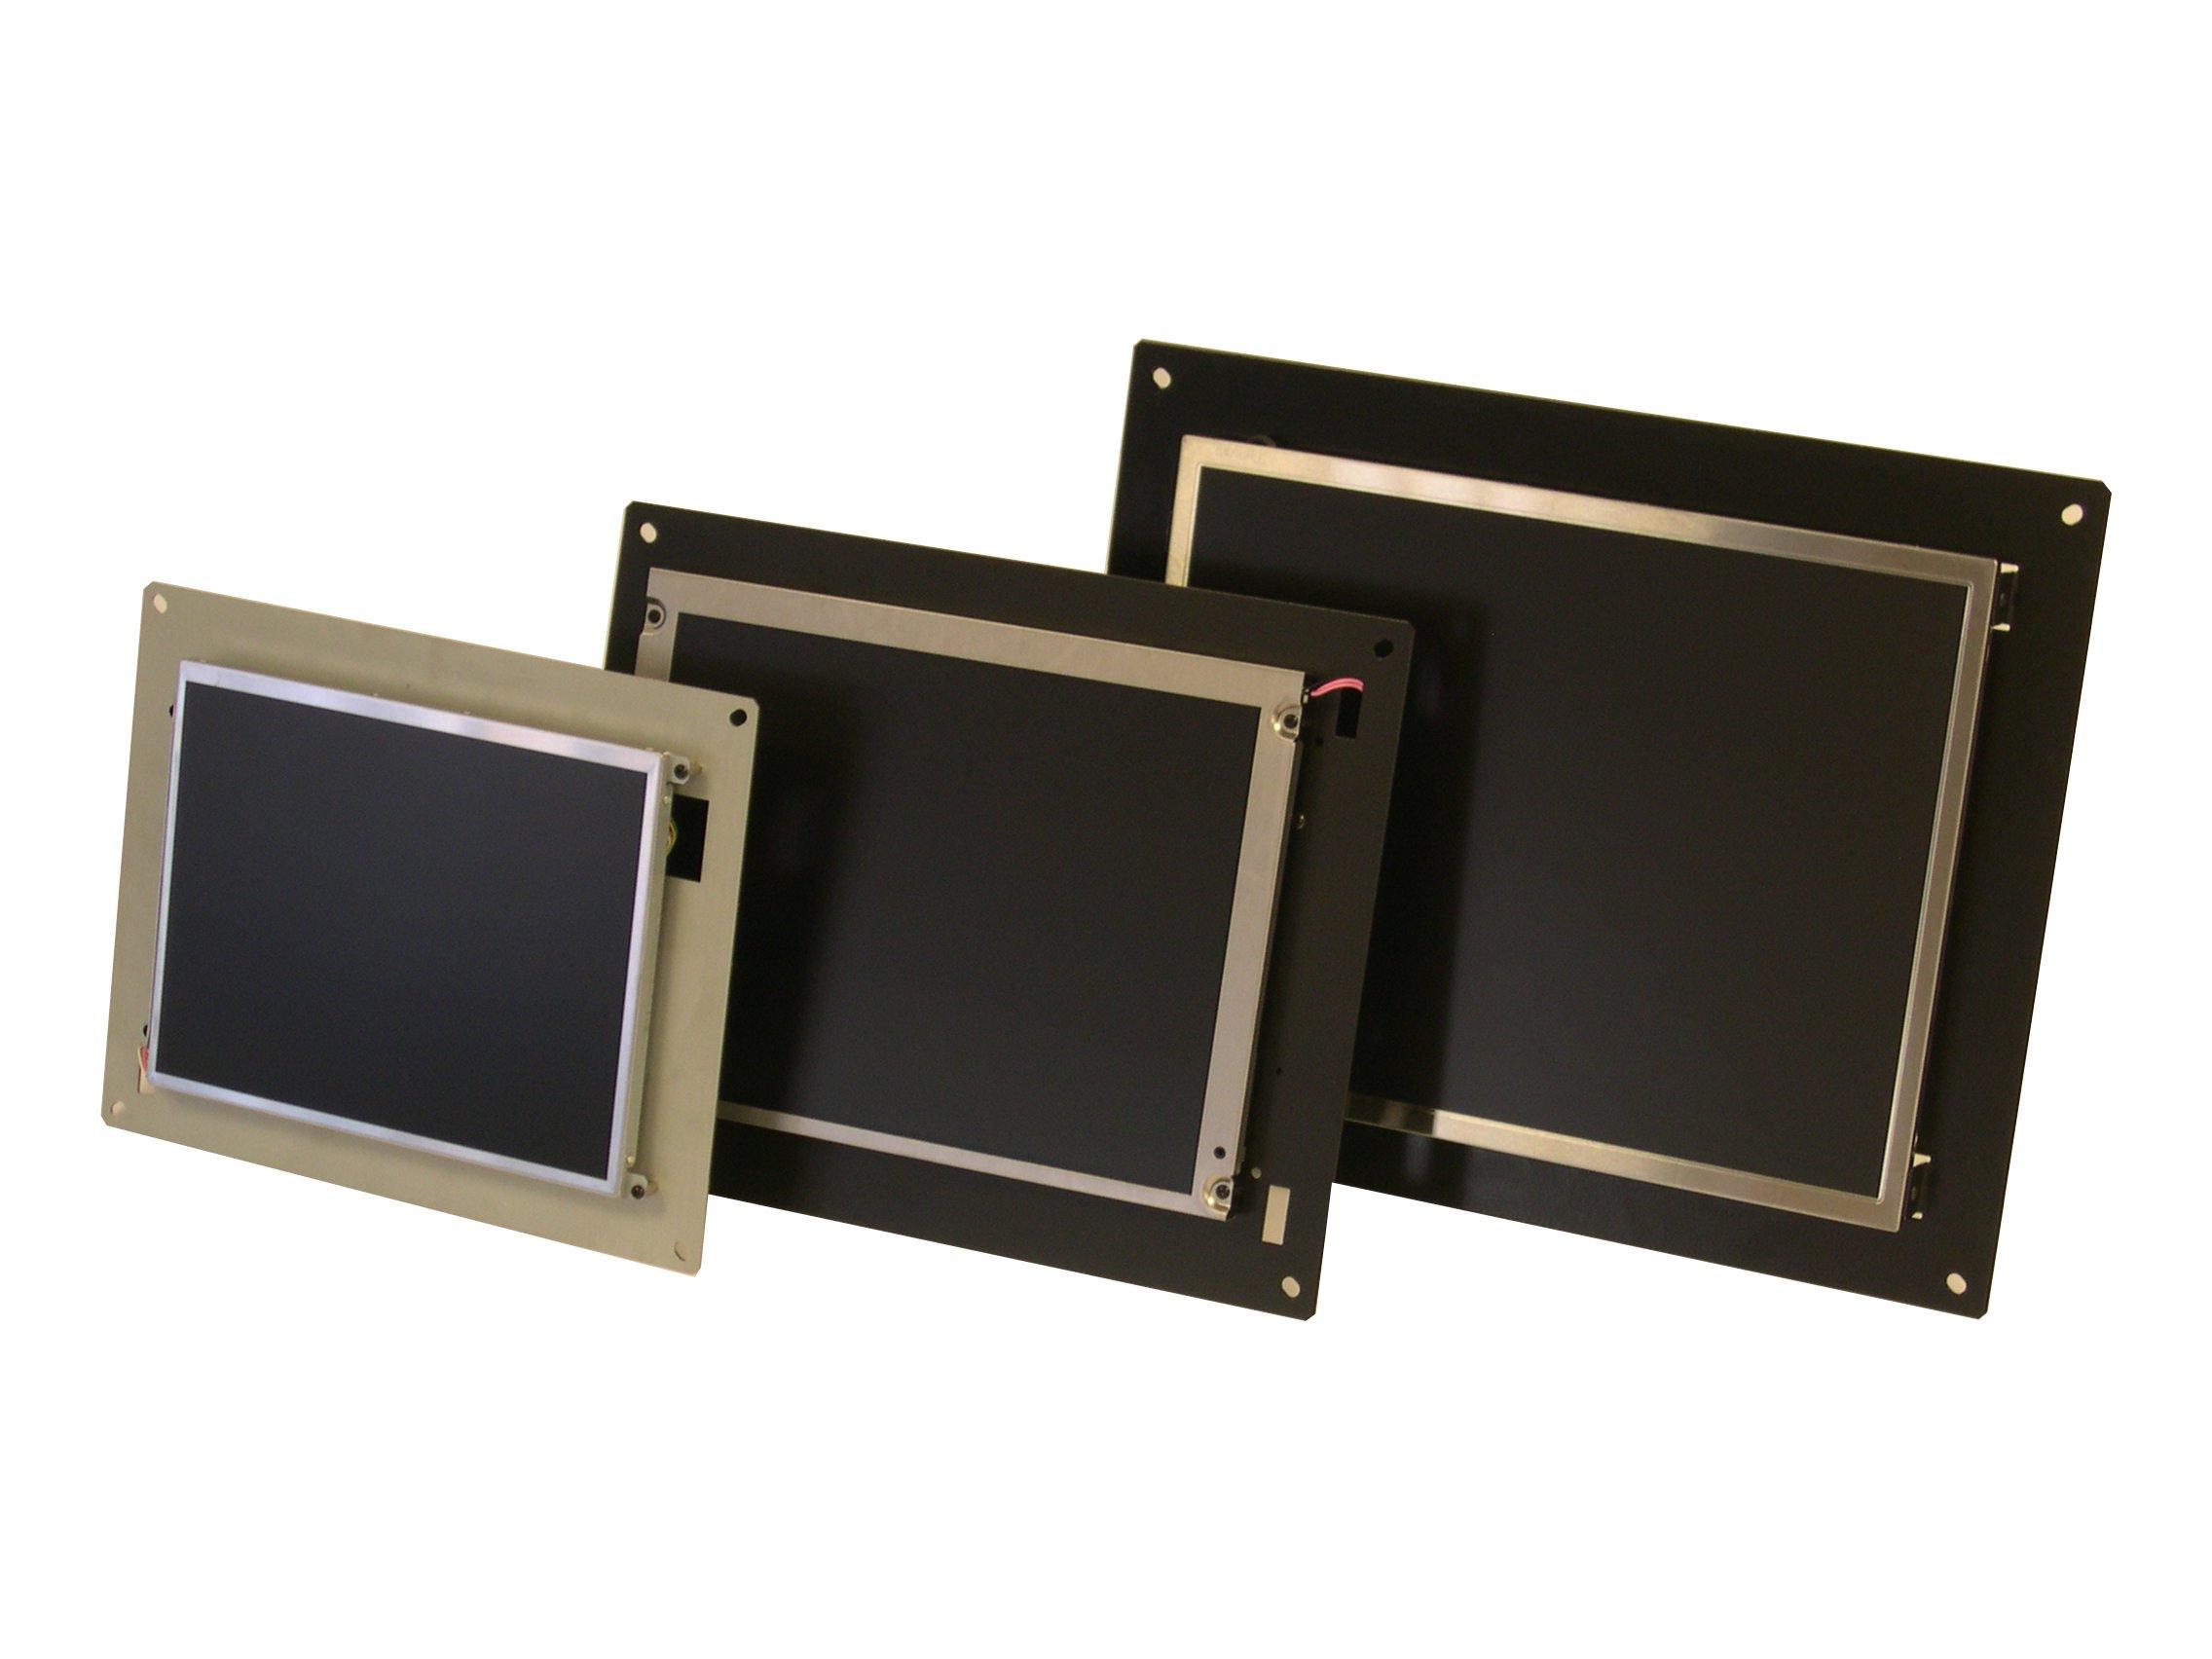 LCD INDUSTRIEL MACHINE OUTIL